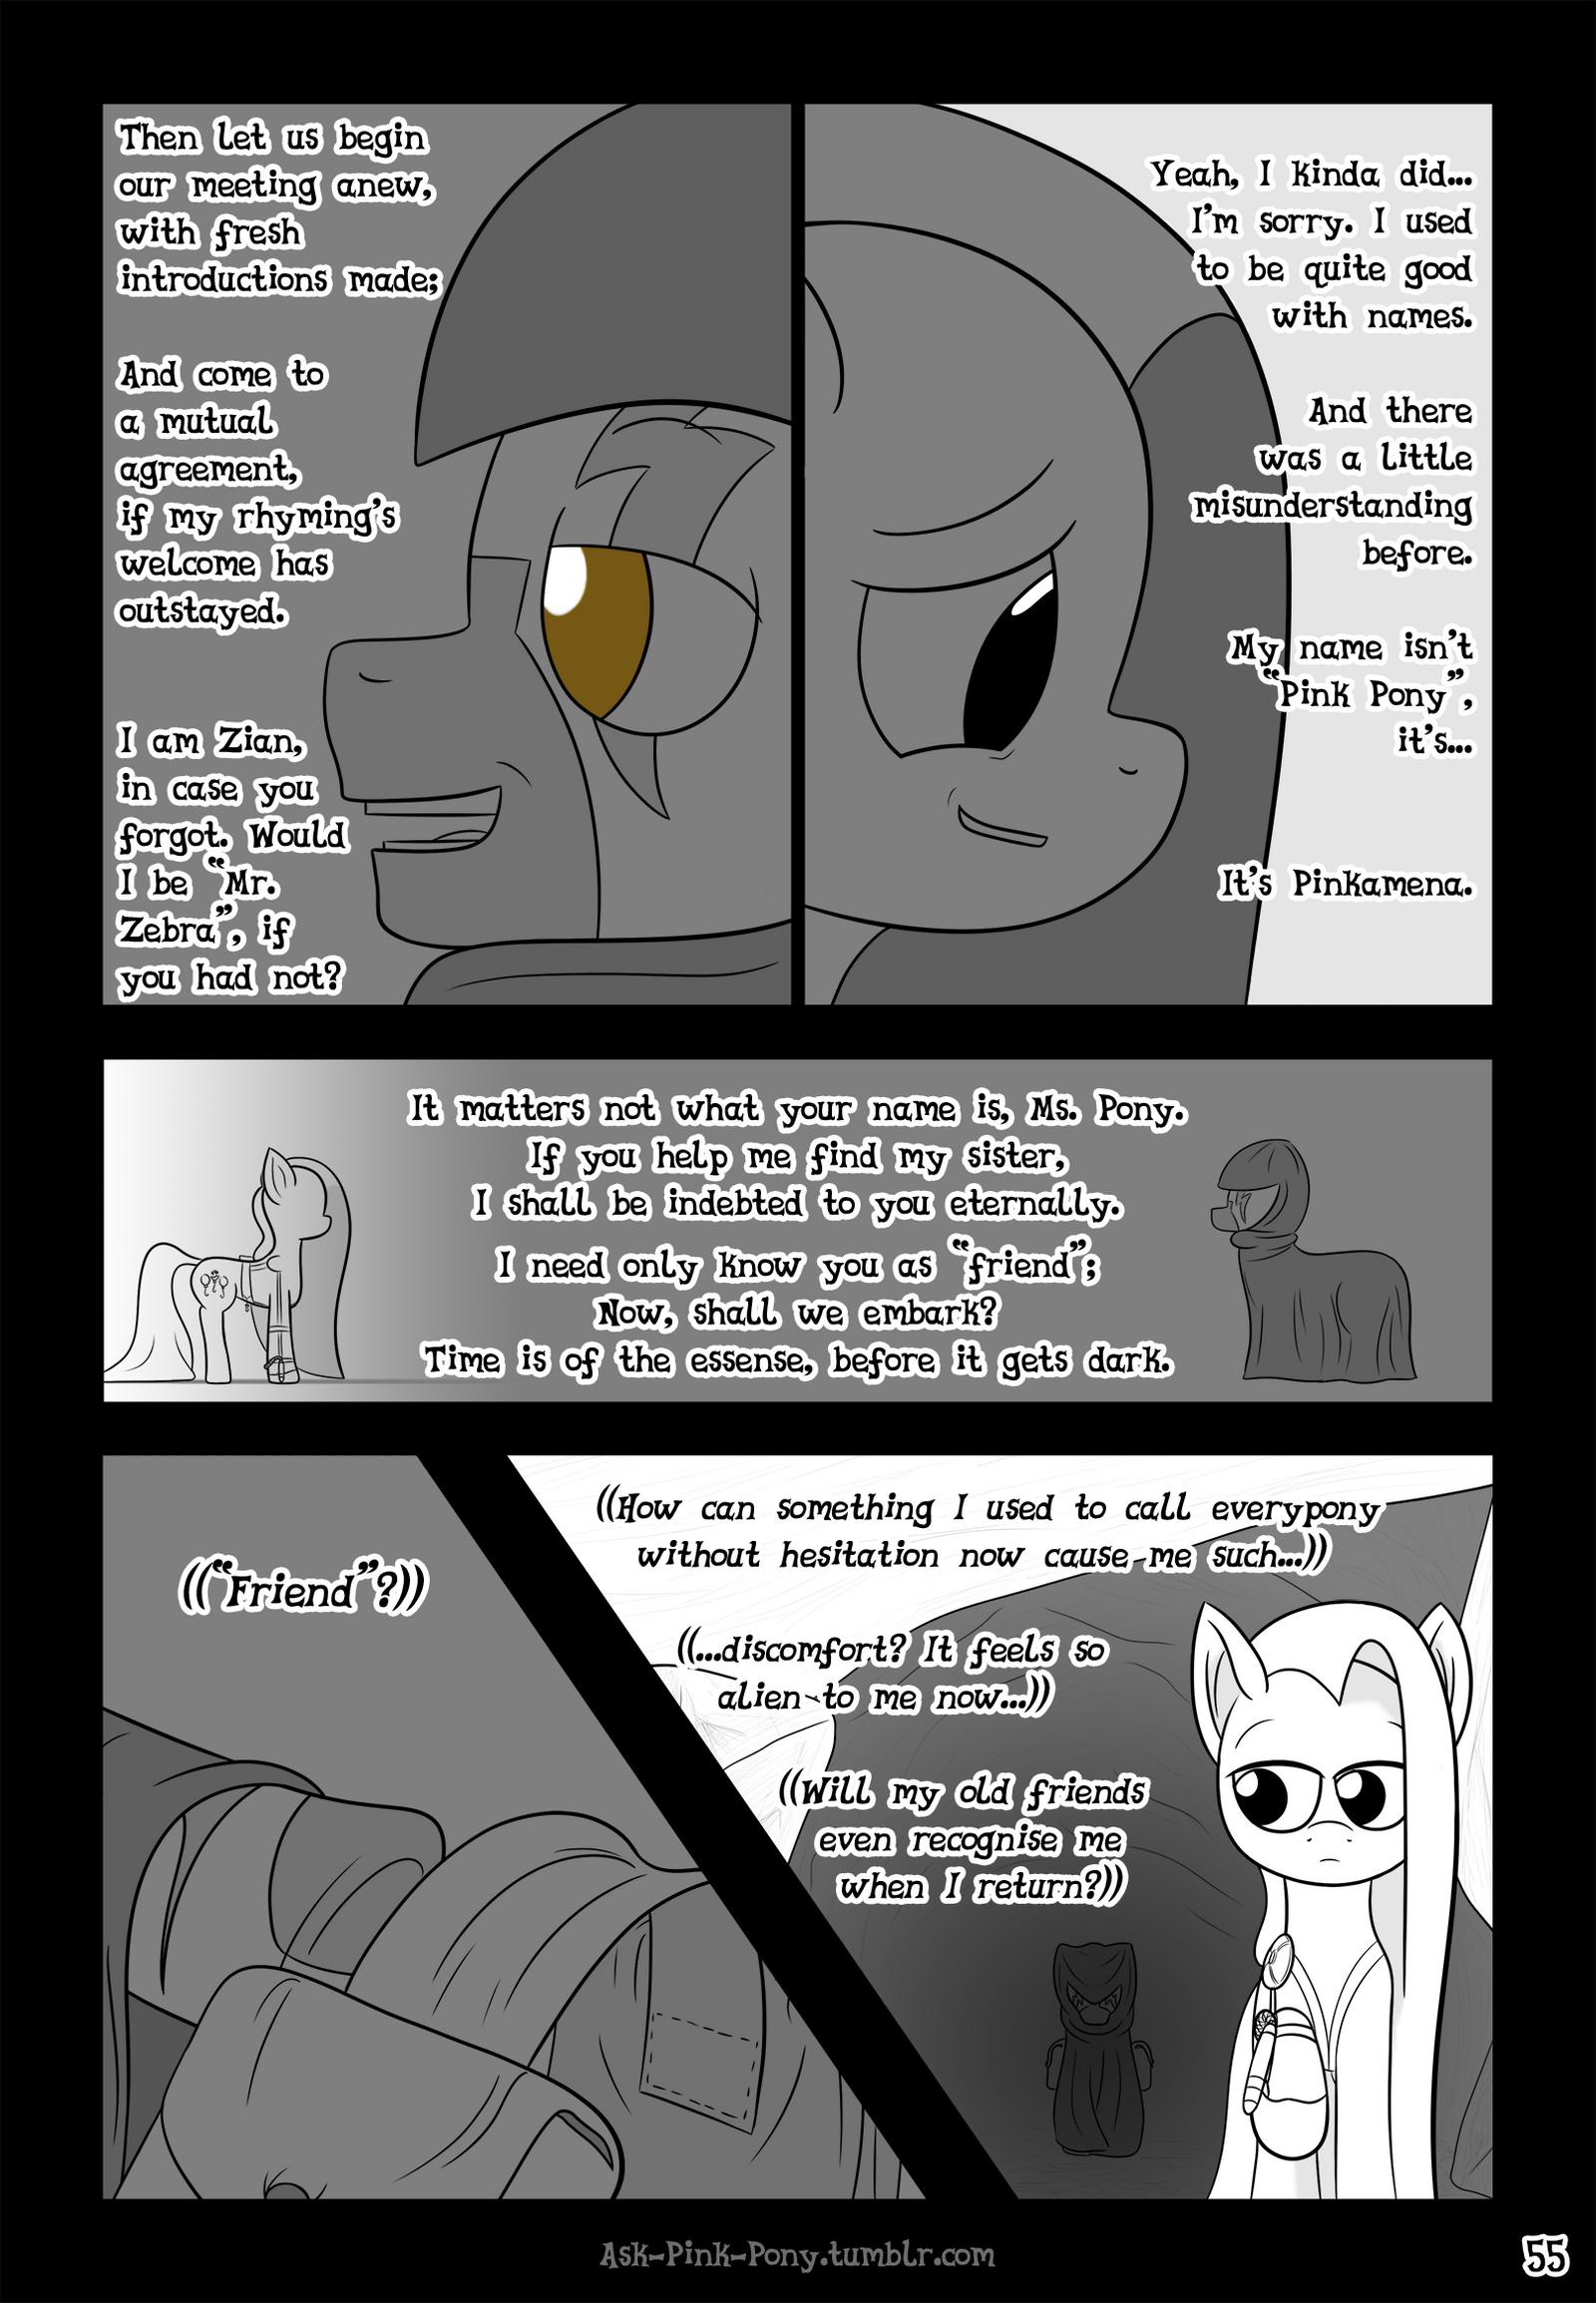 Ask-Pink-Pony #55 by UnderwoodART